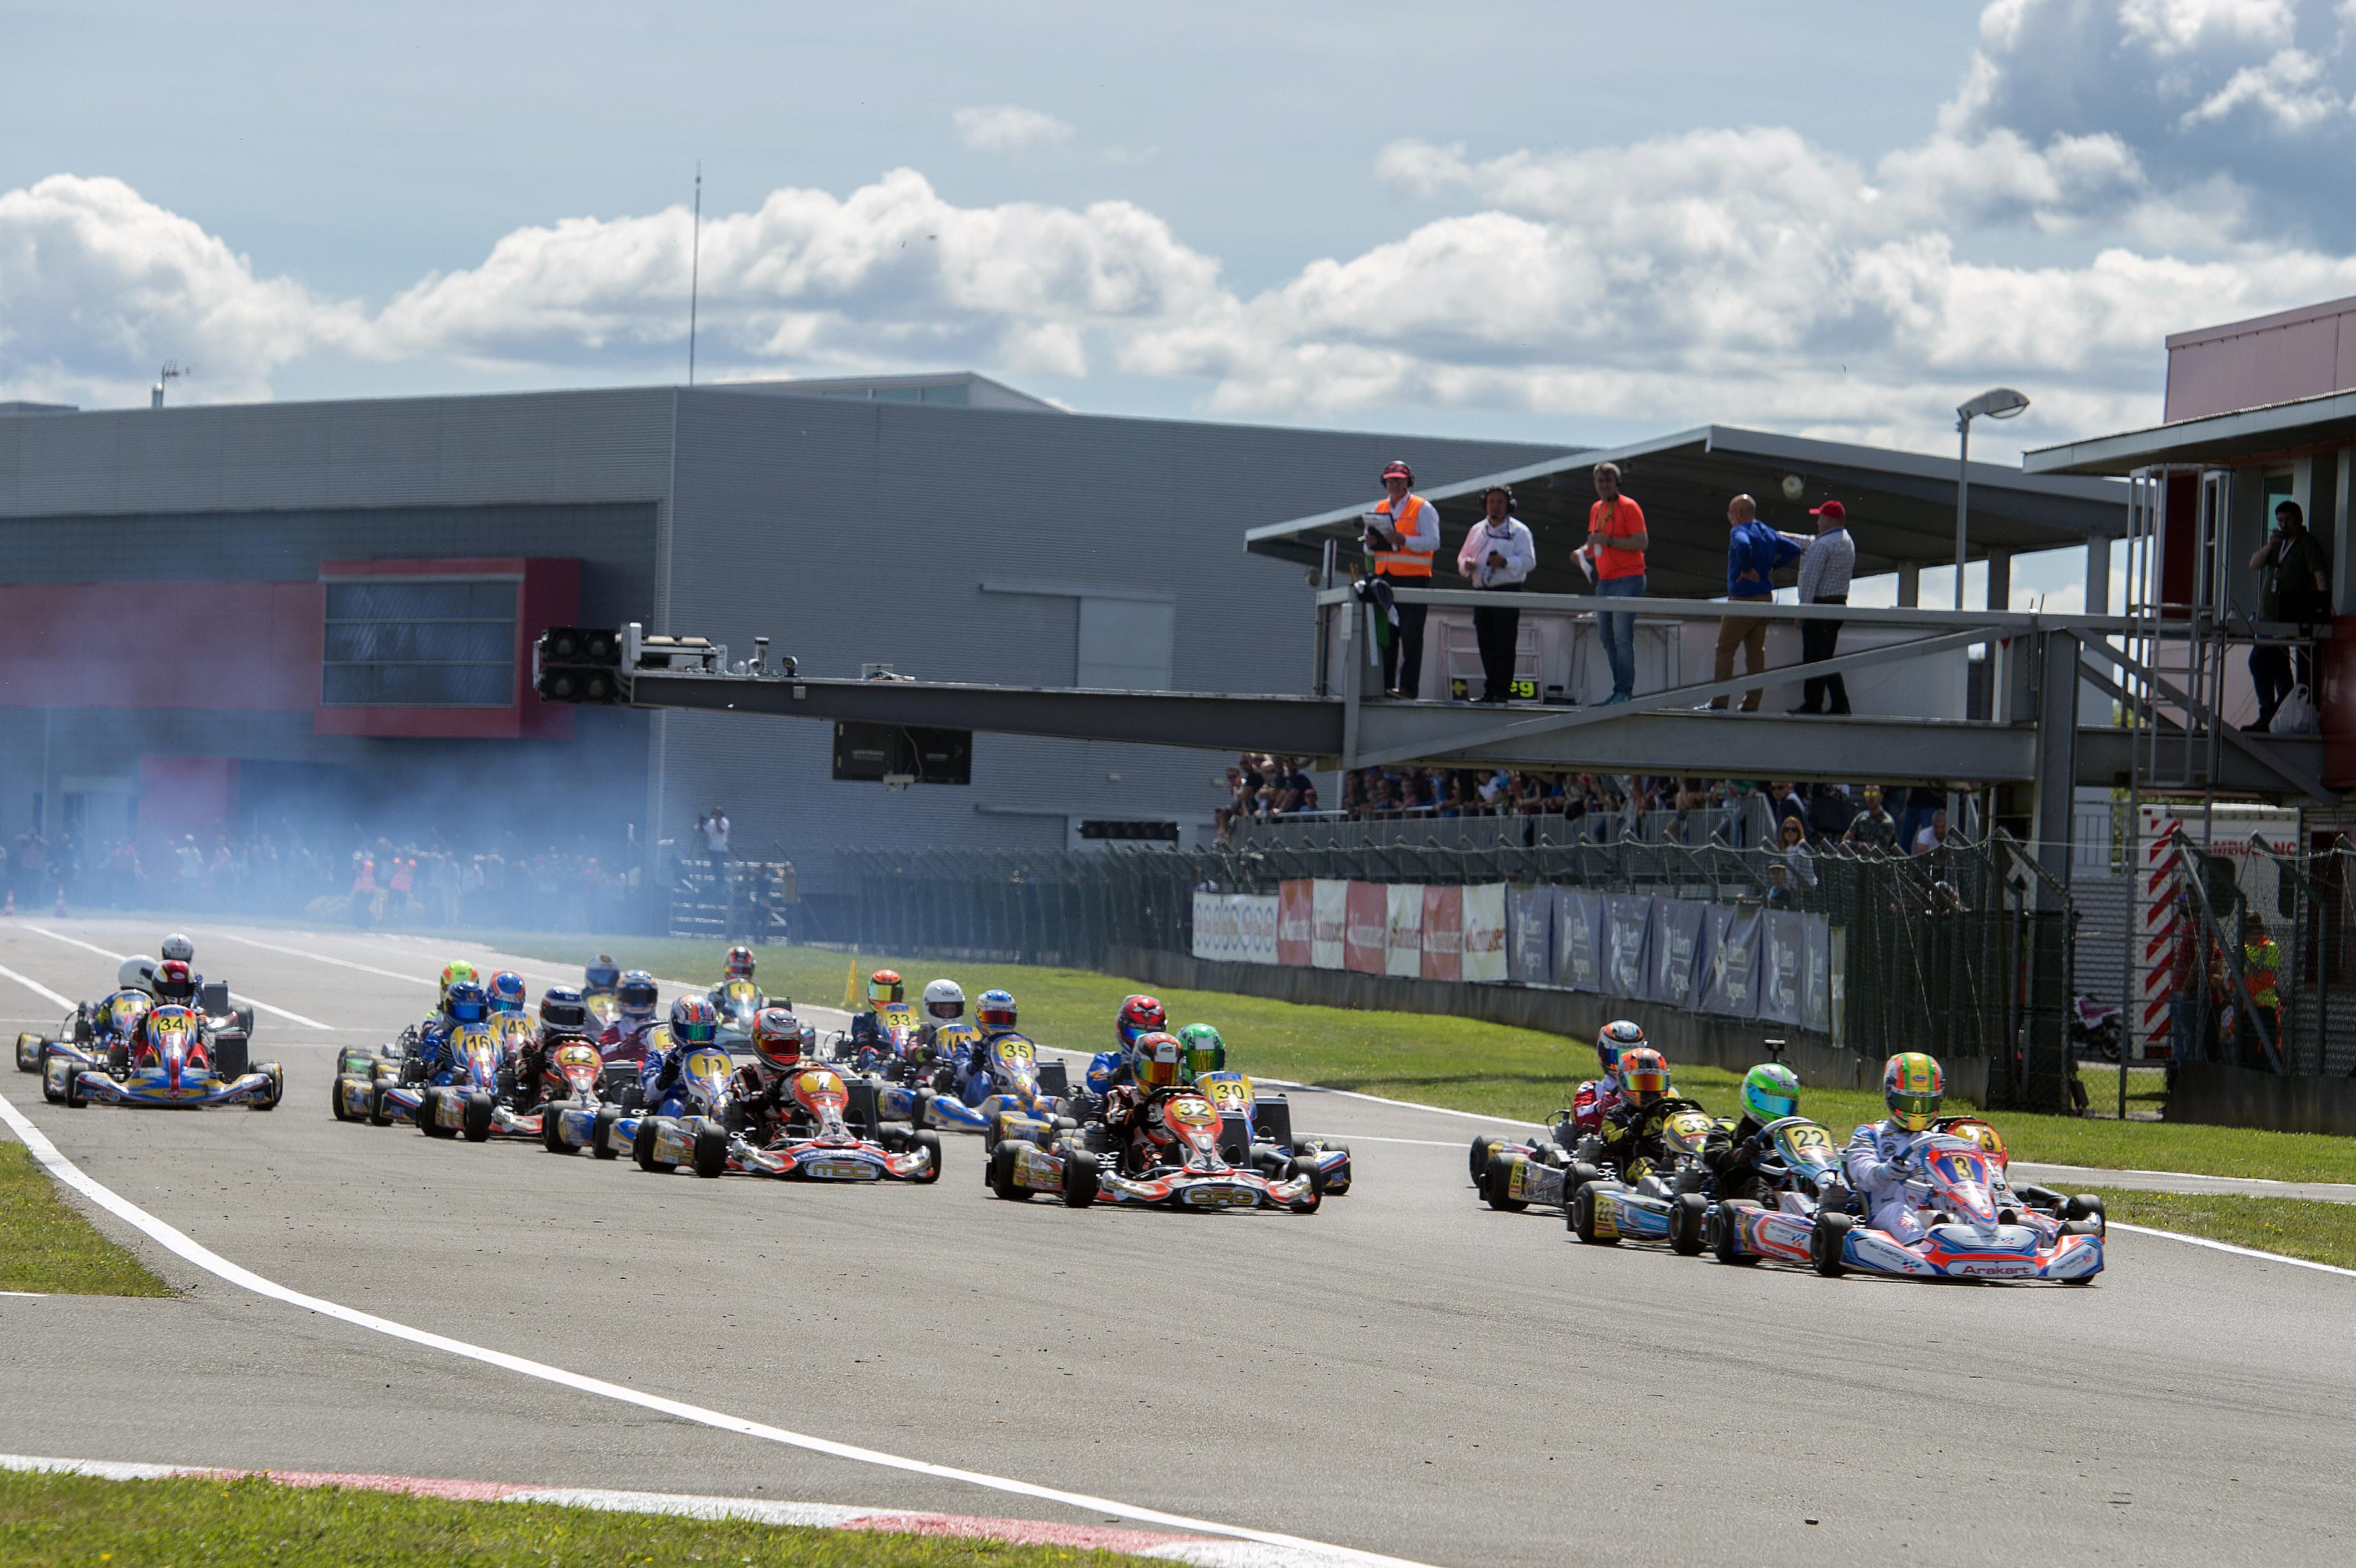 Circuito Fernando Alonso Oviedo : Campeonato de españa de karting prueba circuito fernando